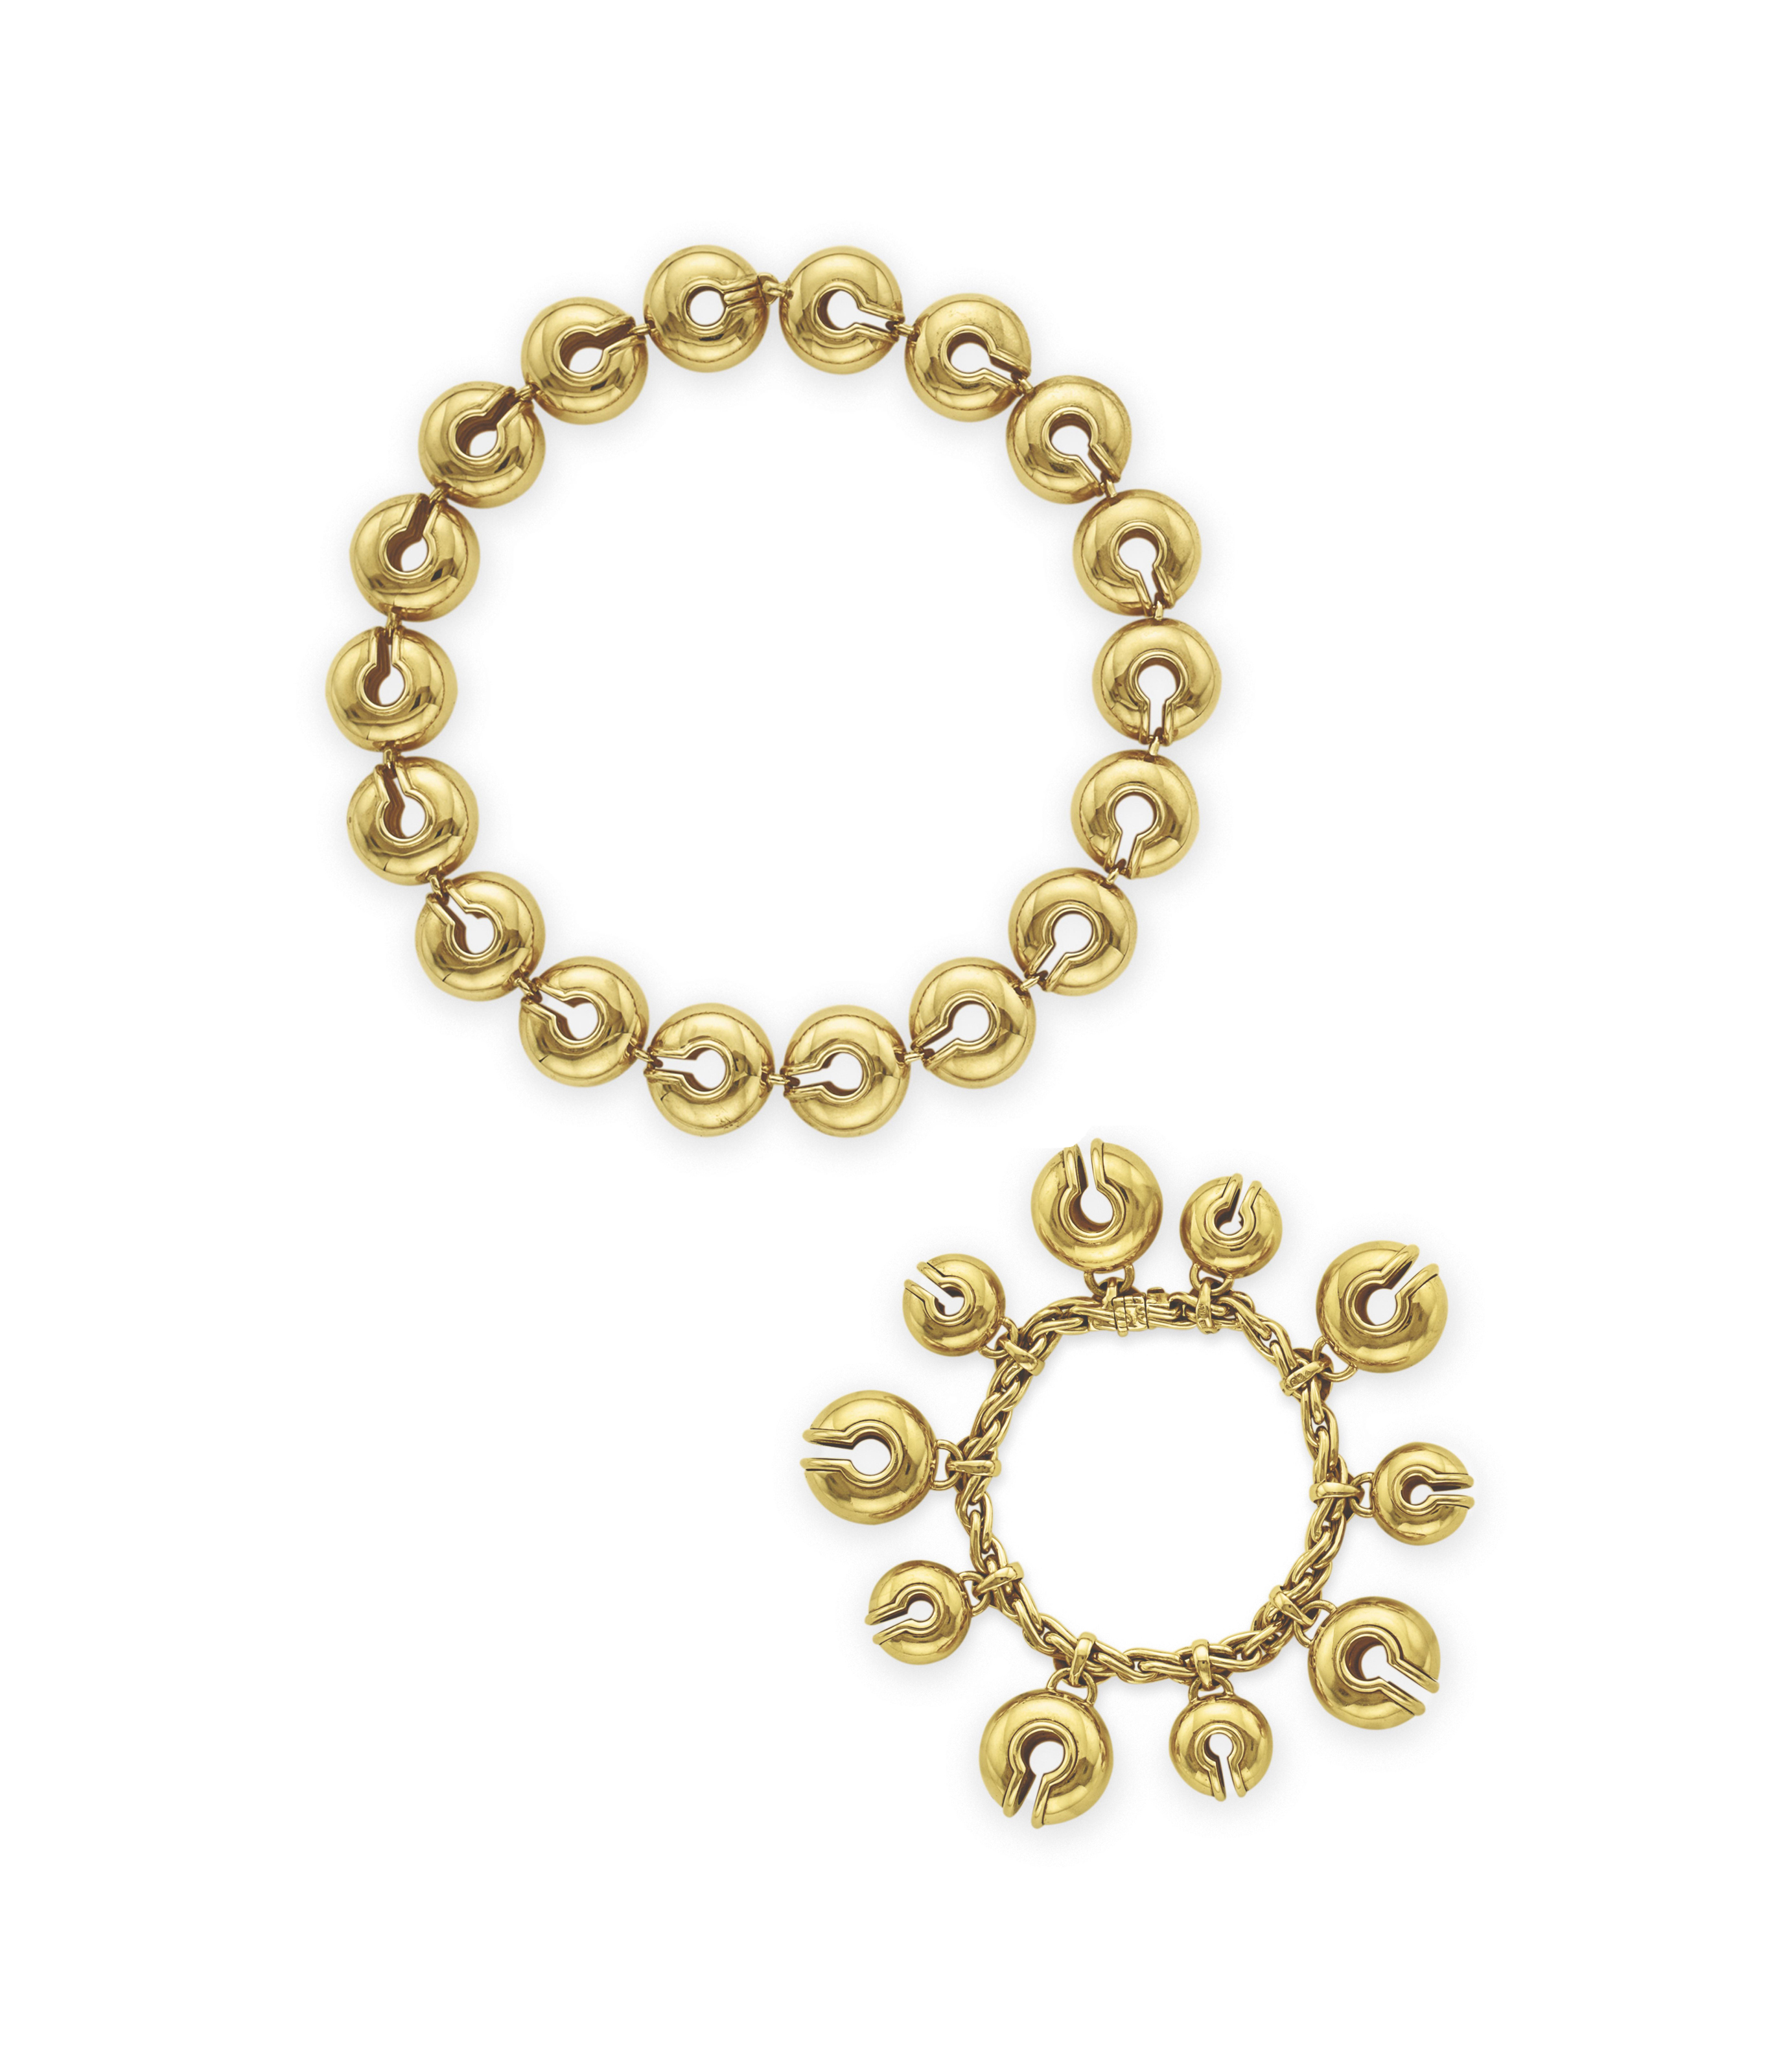 Metal Lion 0136 Waist Chain Gold or Silver